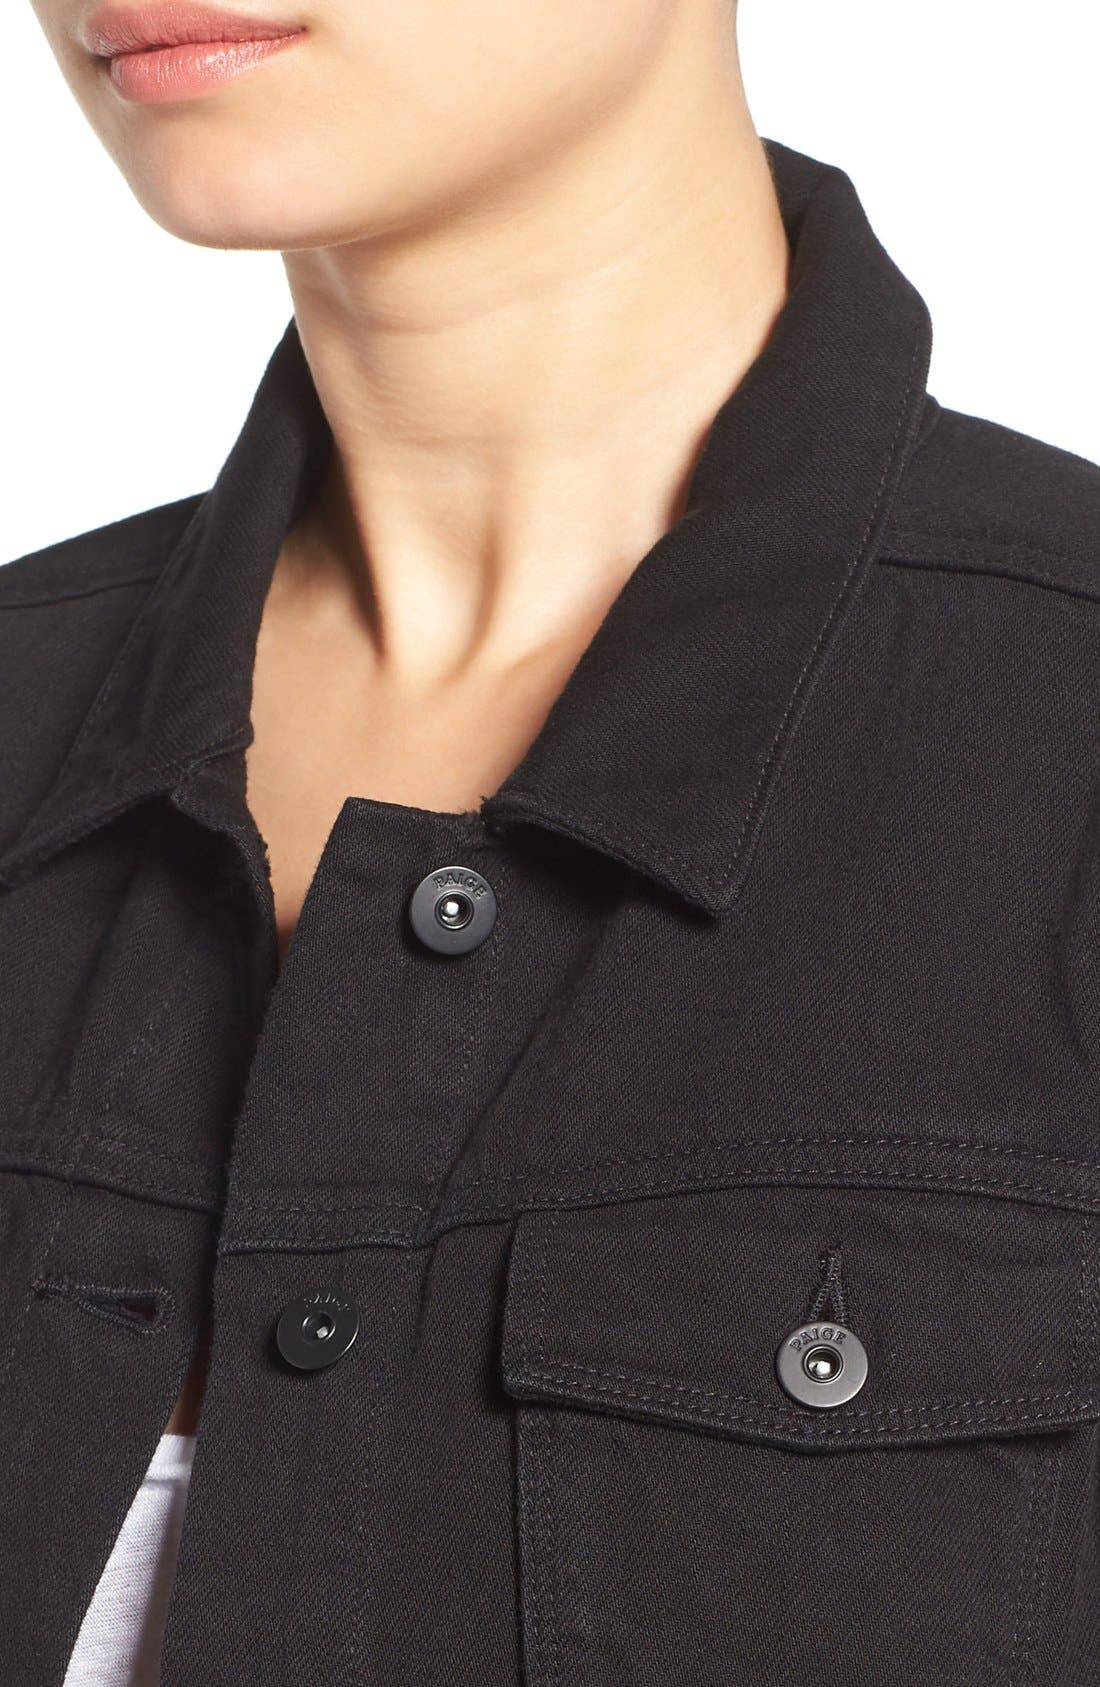 'Vivienne' Denim Jacket,                             Alternate thumbnail 4, color,                             Black Hawk